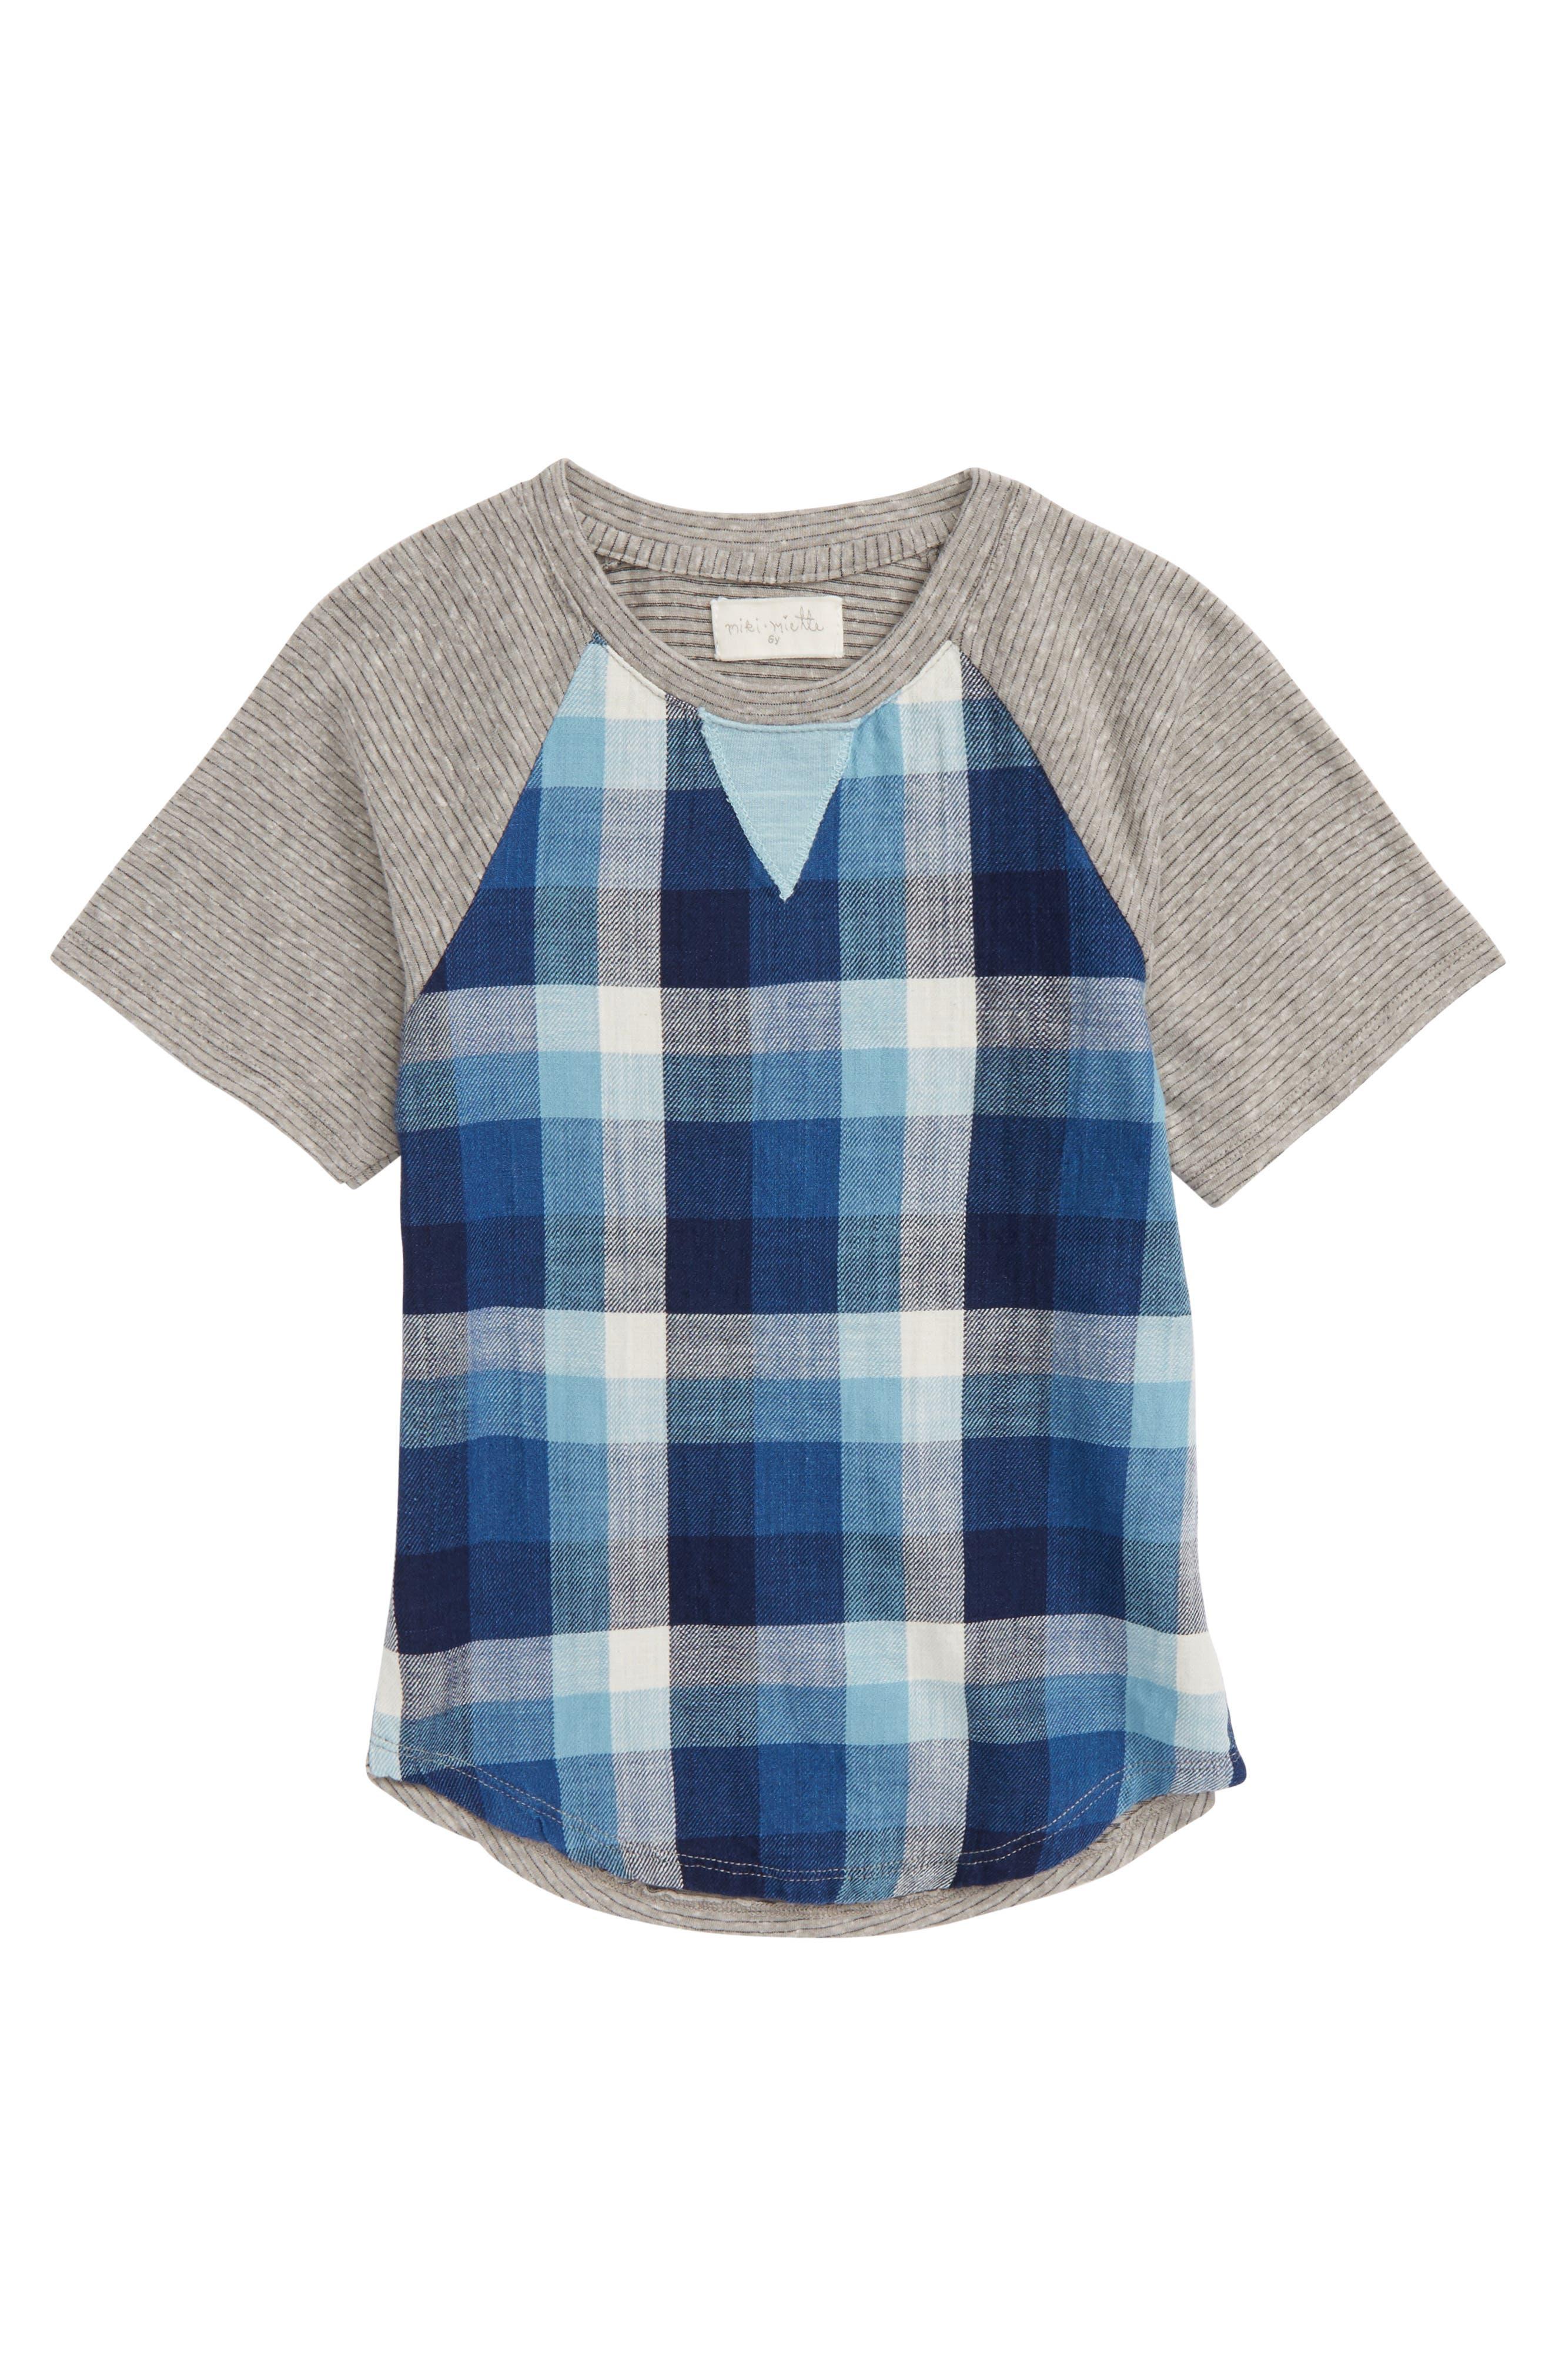 Main Image - Miki Miette Caz Plaid T-Shirt (Toddler Boys, Little Boys & Big Boys)